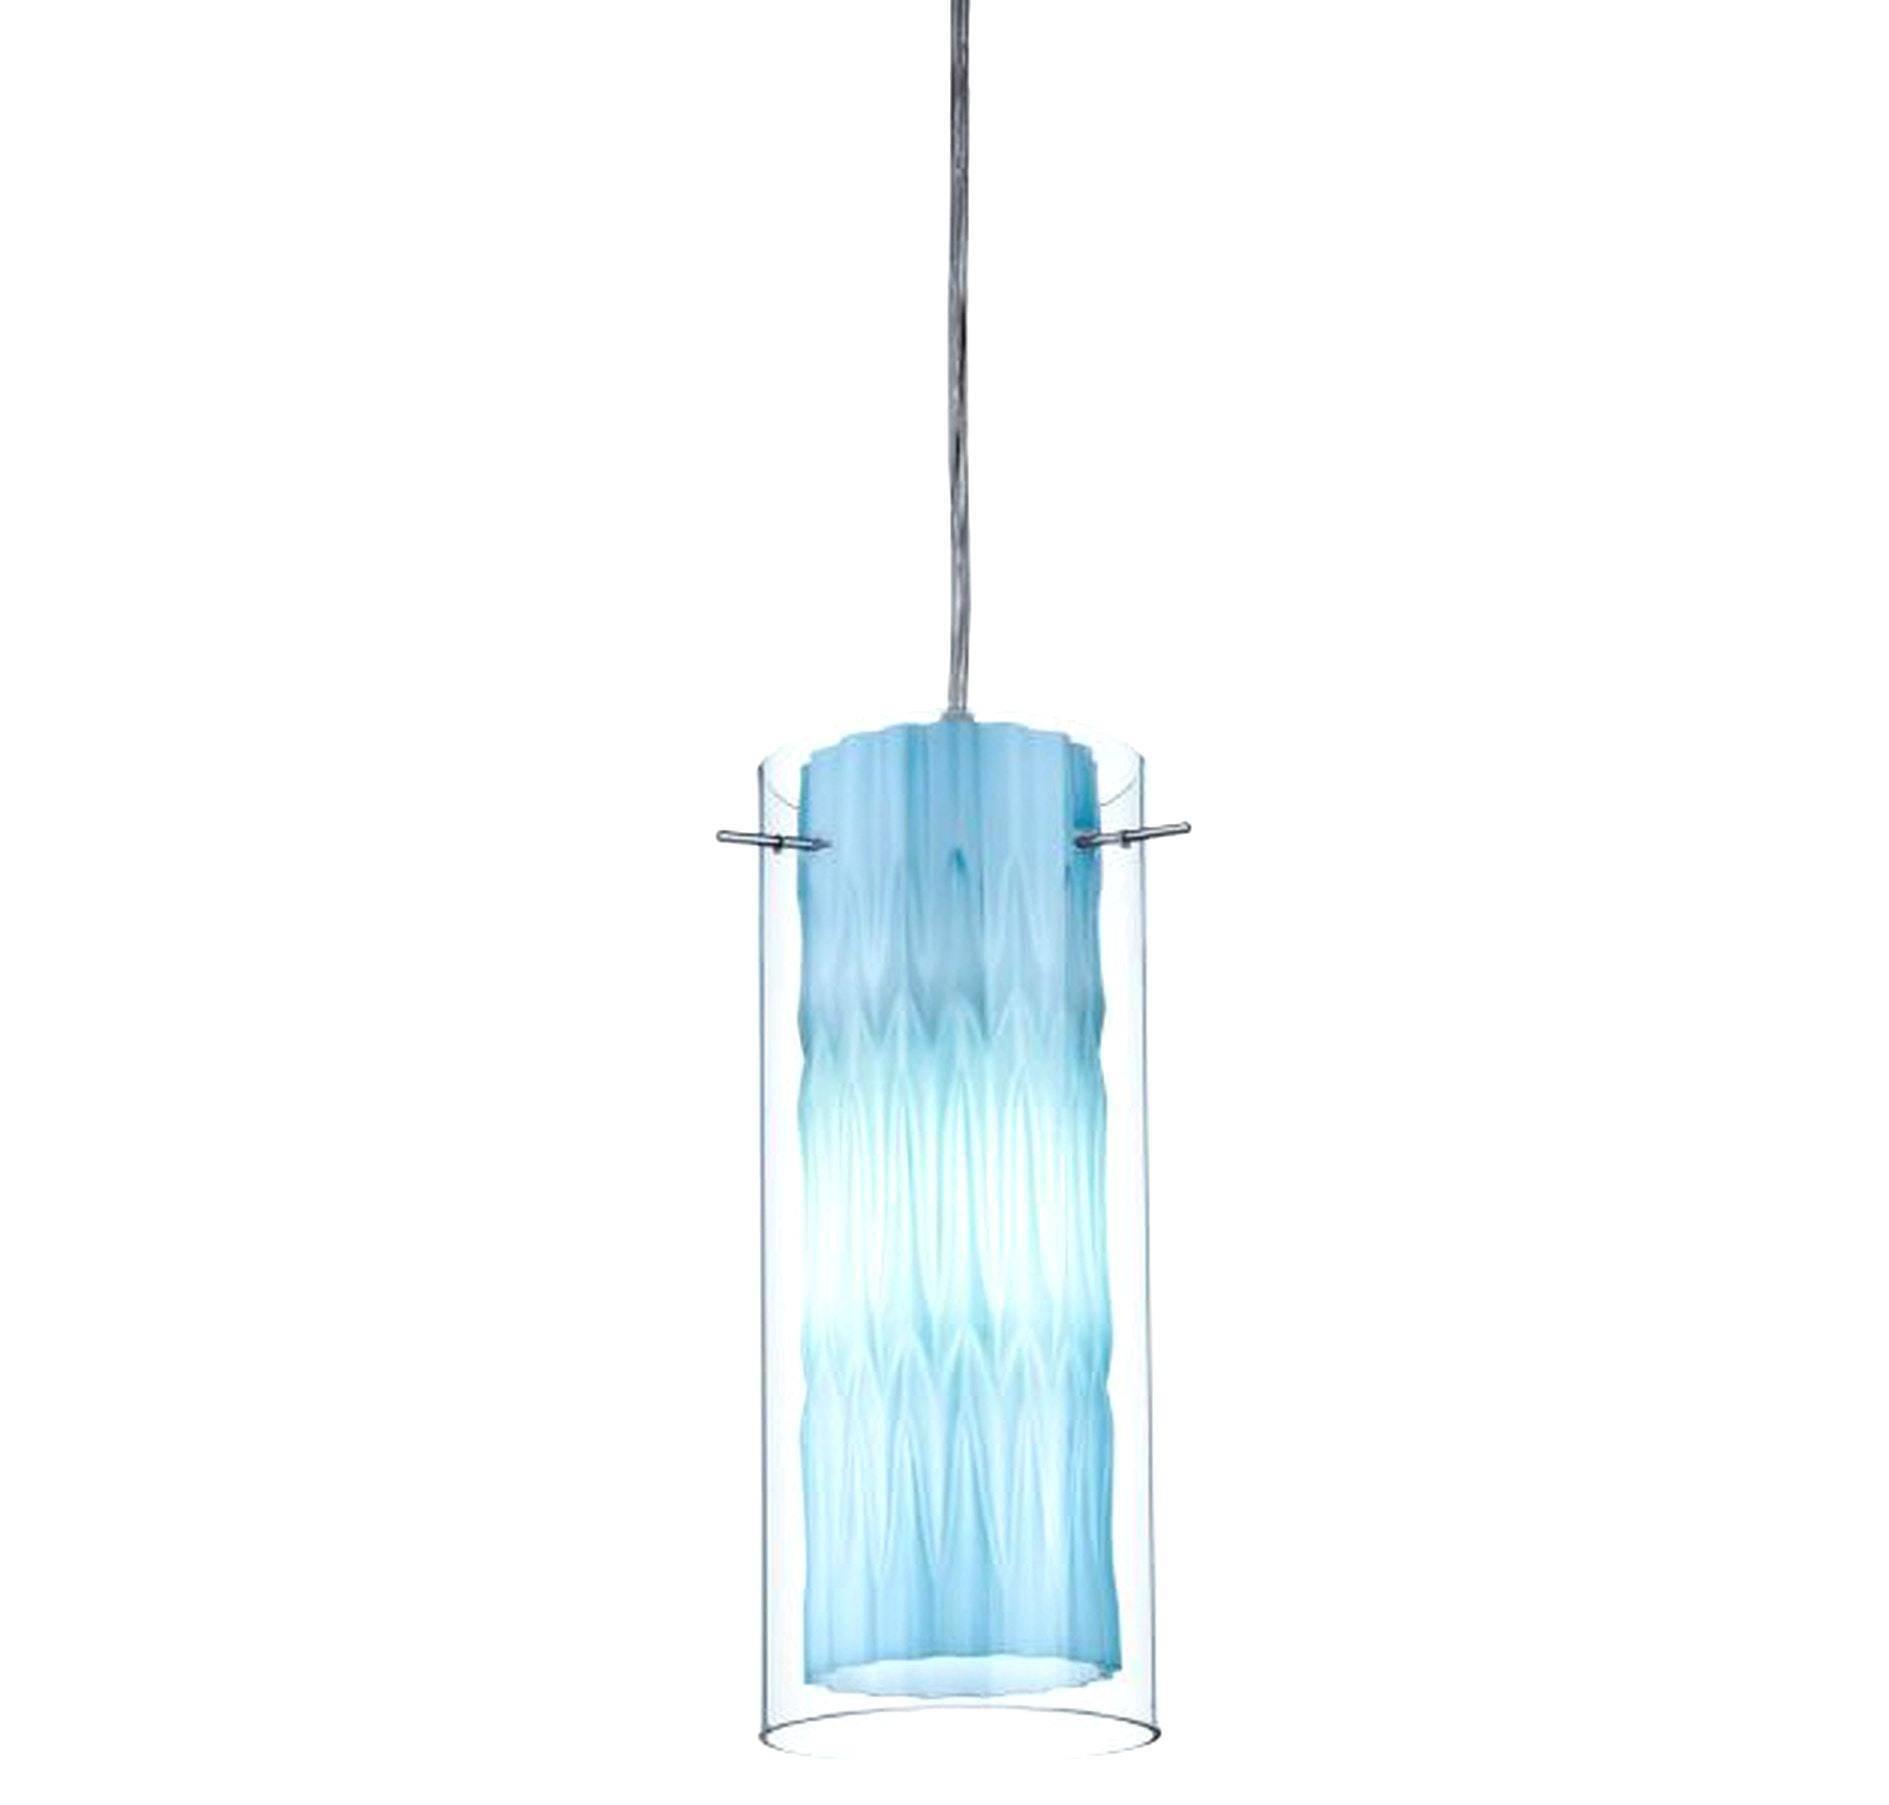 Cobalt Blue Pendant Light With Lighting Design Ideas Aqua Metal Inside Blue Glass Pendant Lights (View 9 of 15)